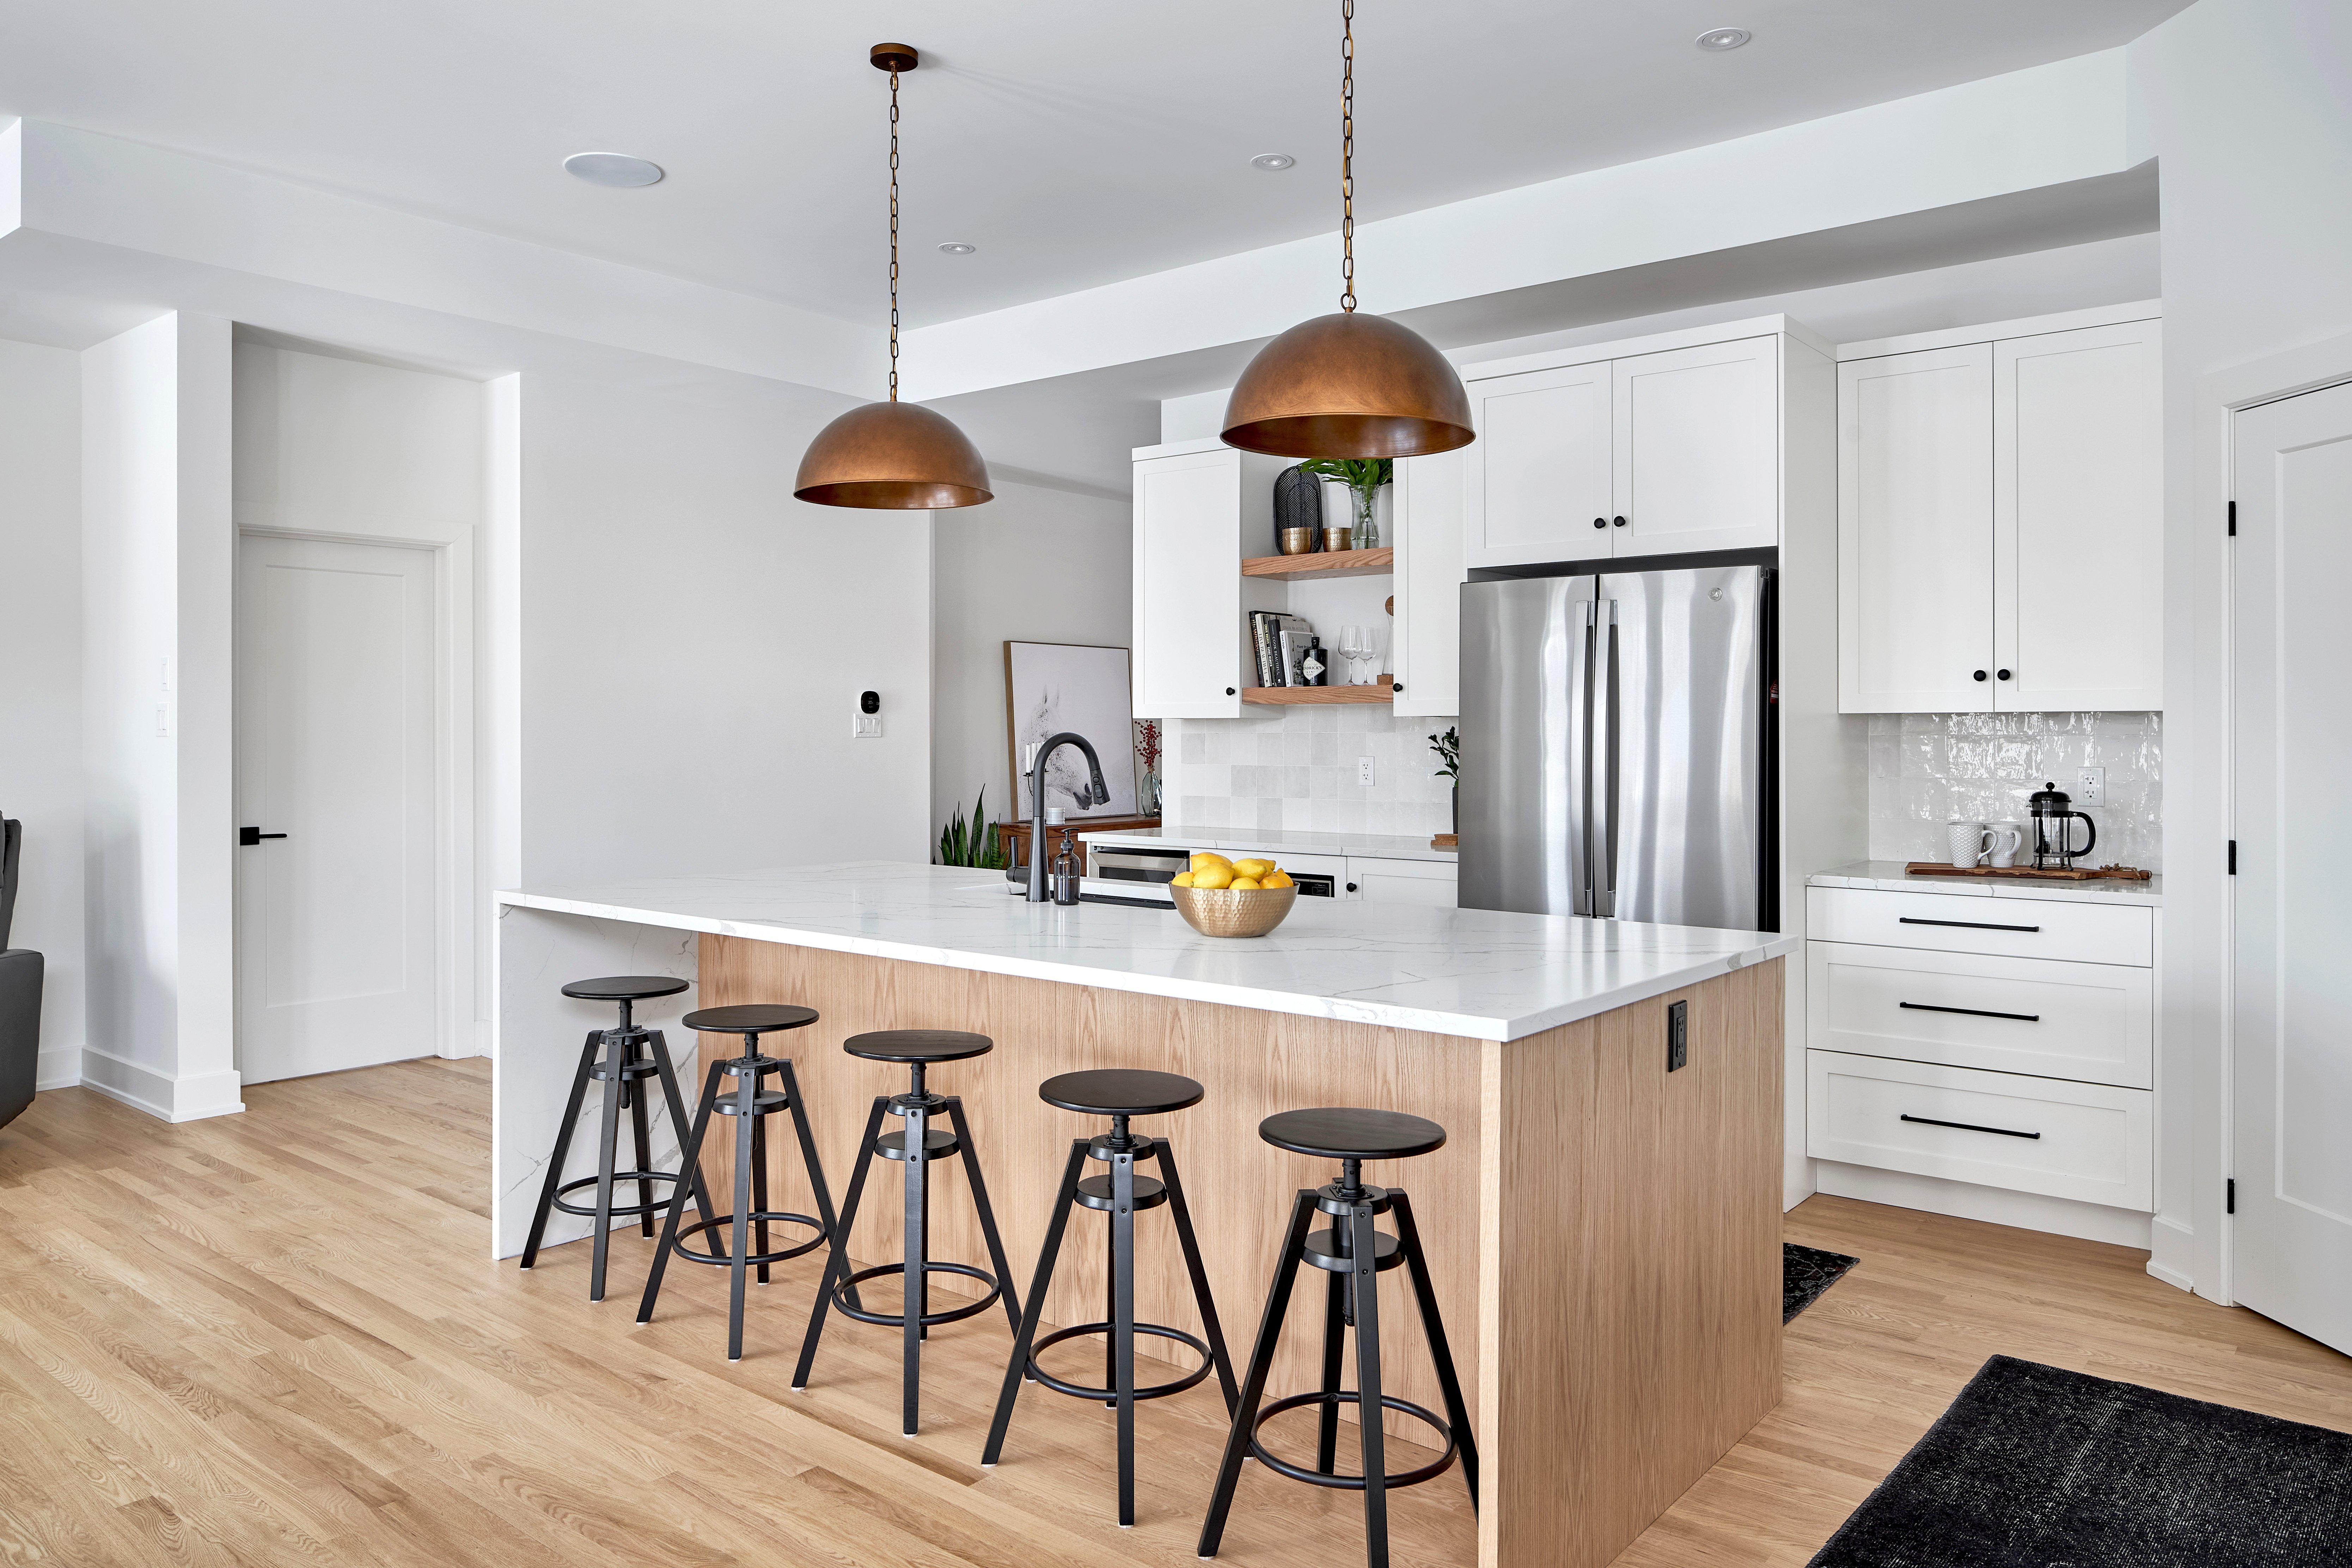 A transitional kitchen design